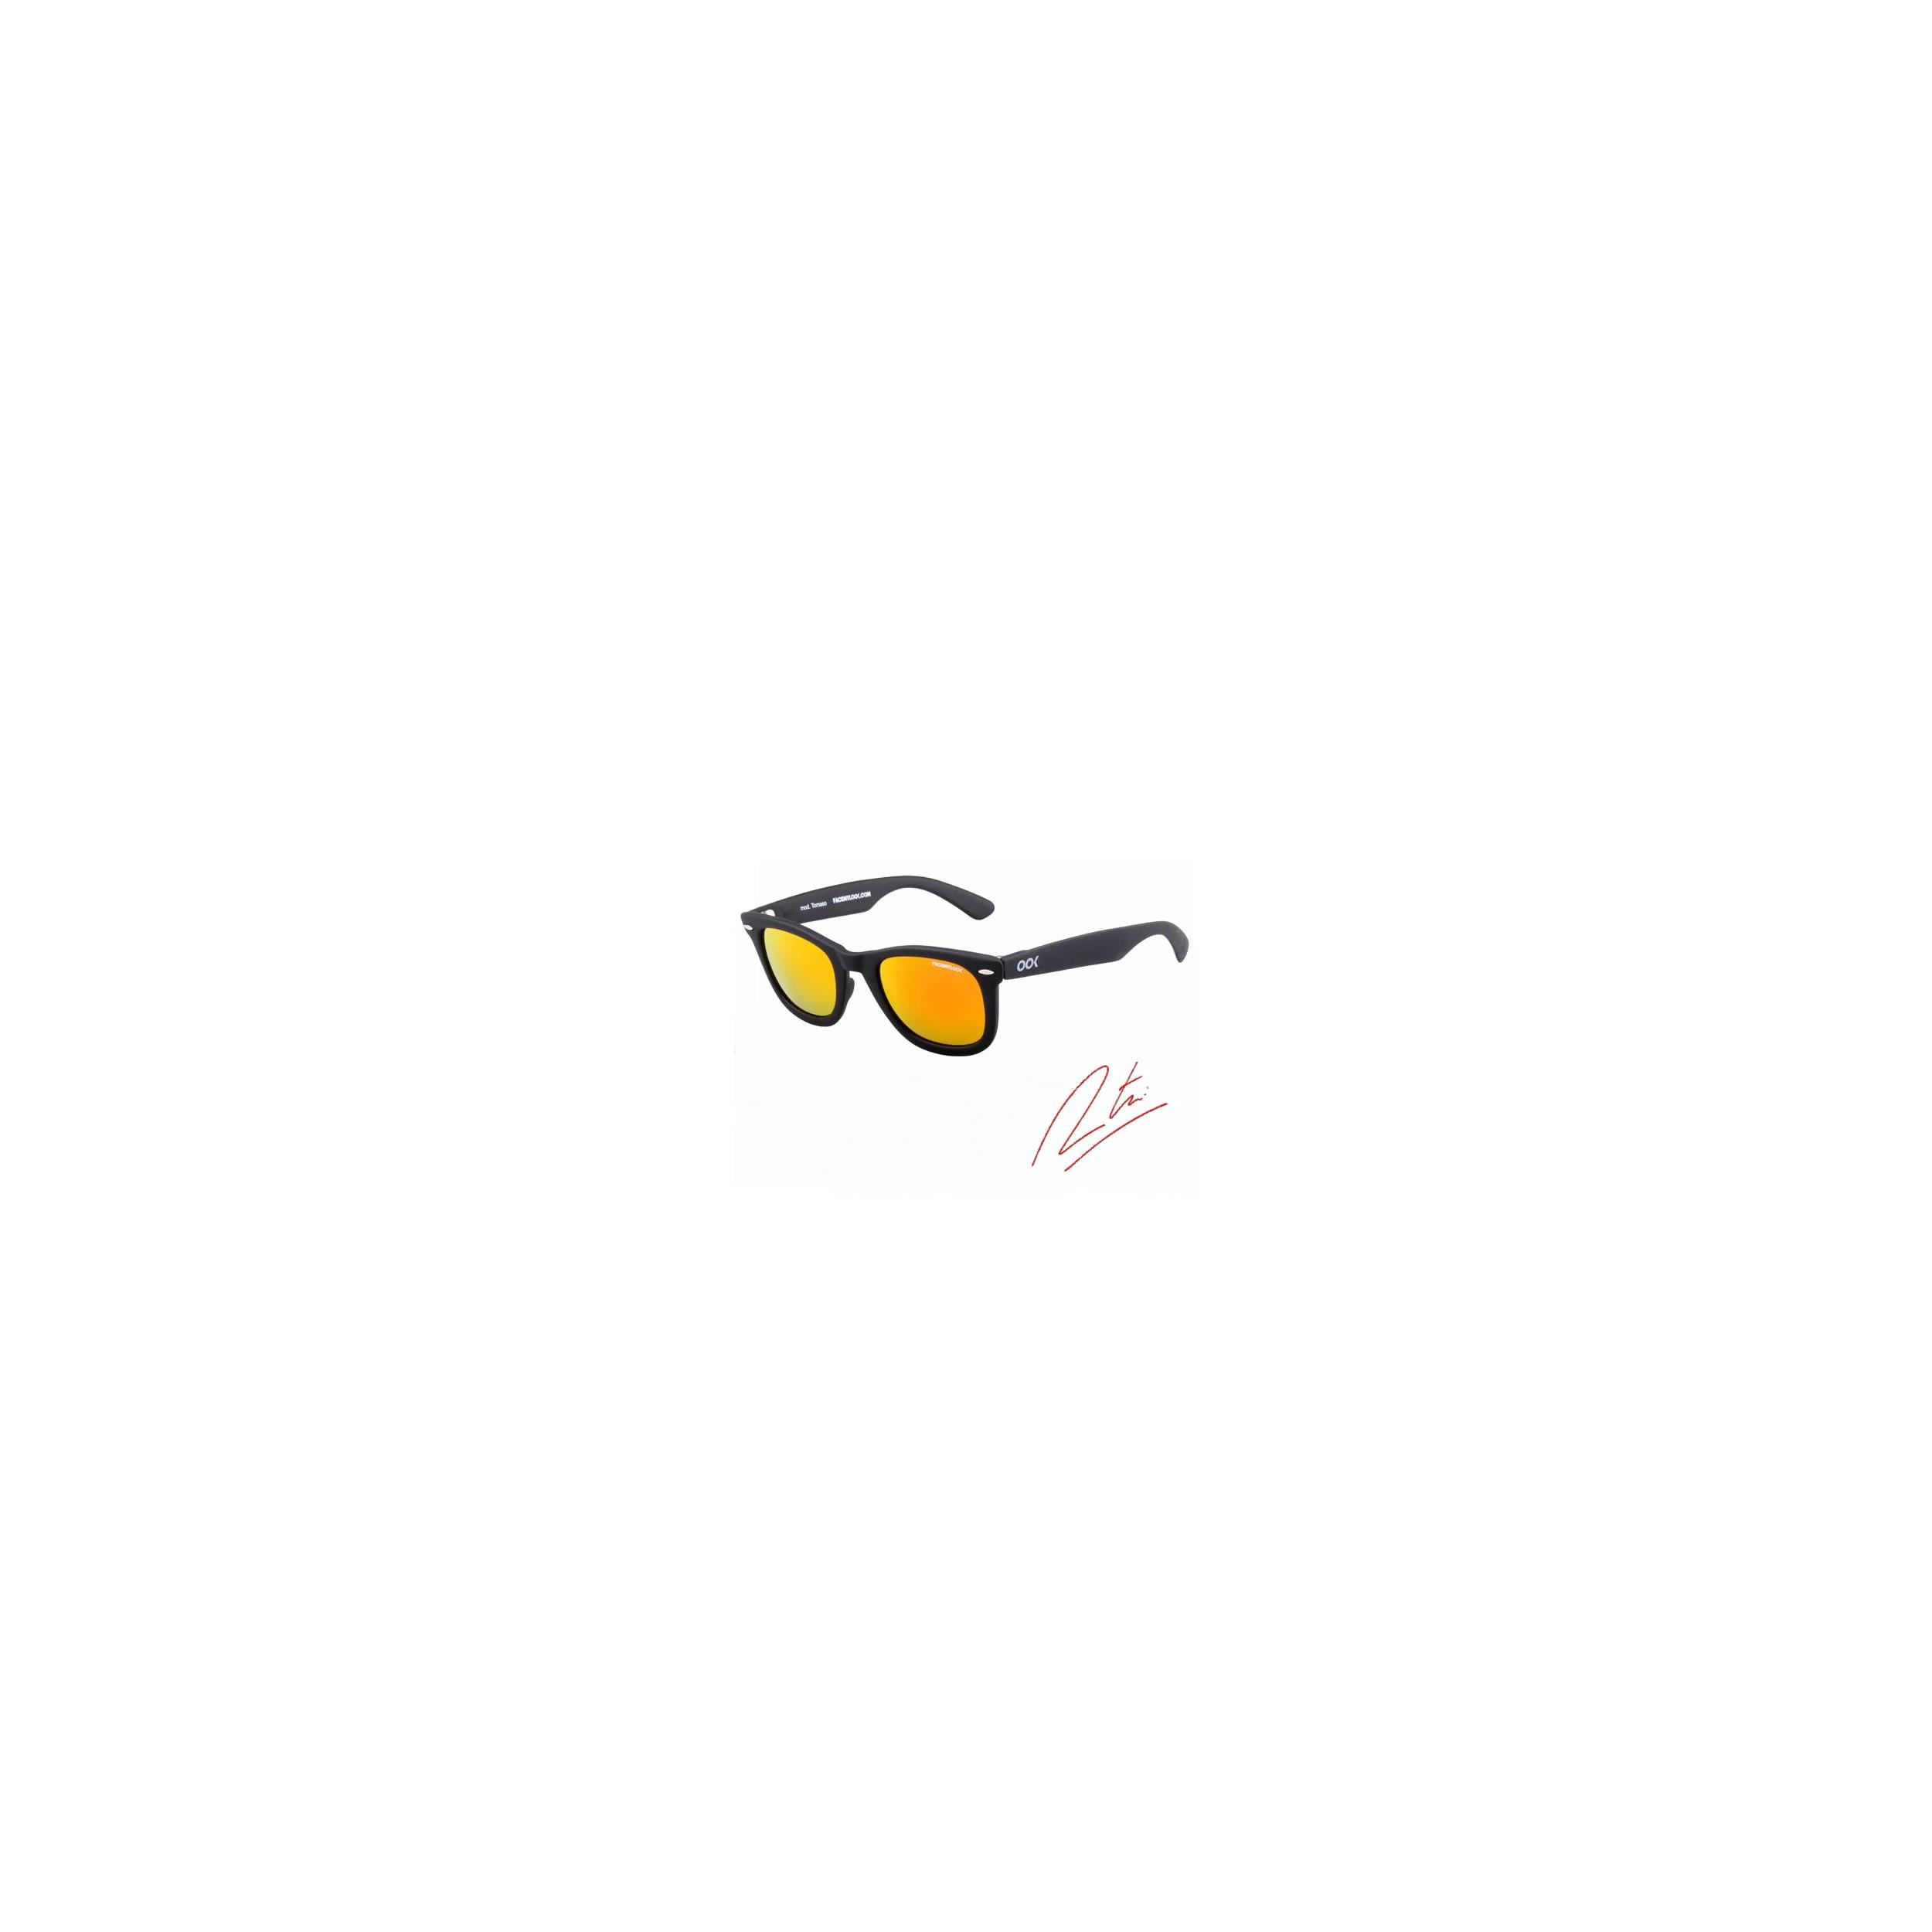 42c94c02d Facemylook | Sunglasses Tomaso-black orange - Category Tomaso